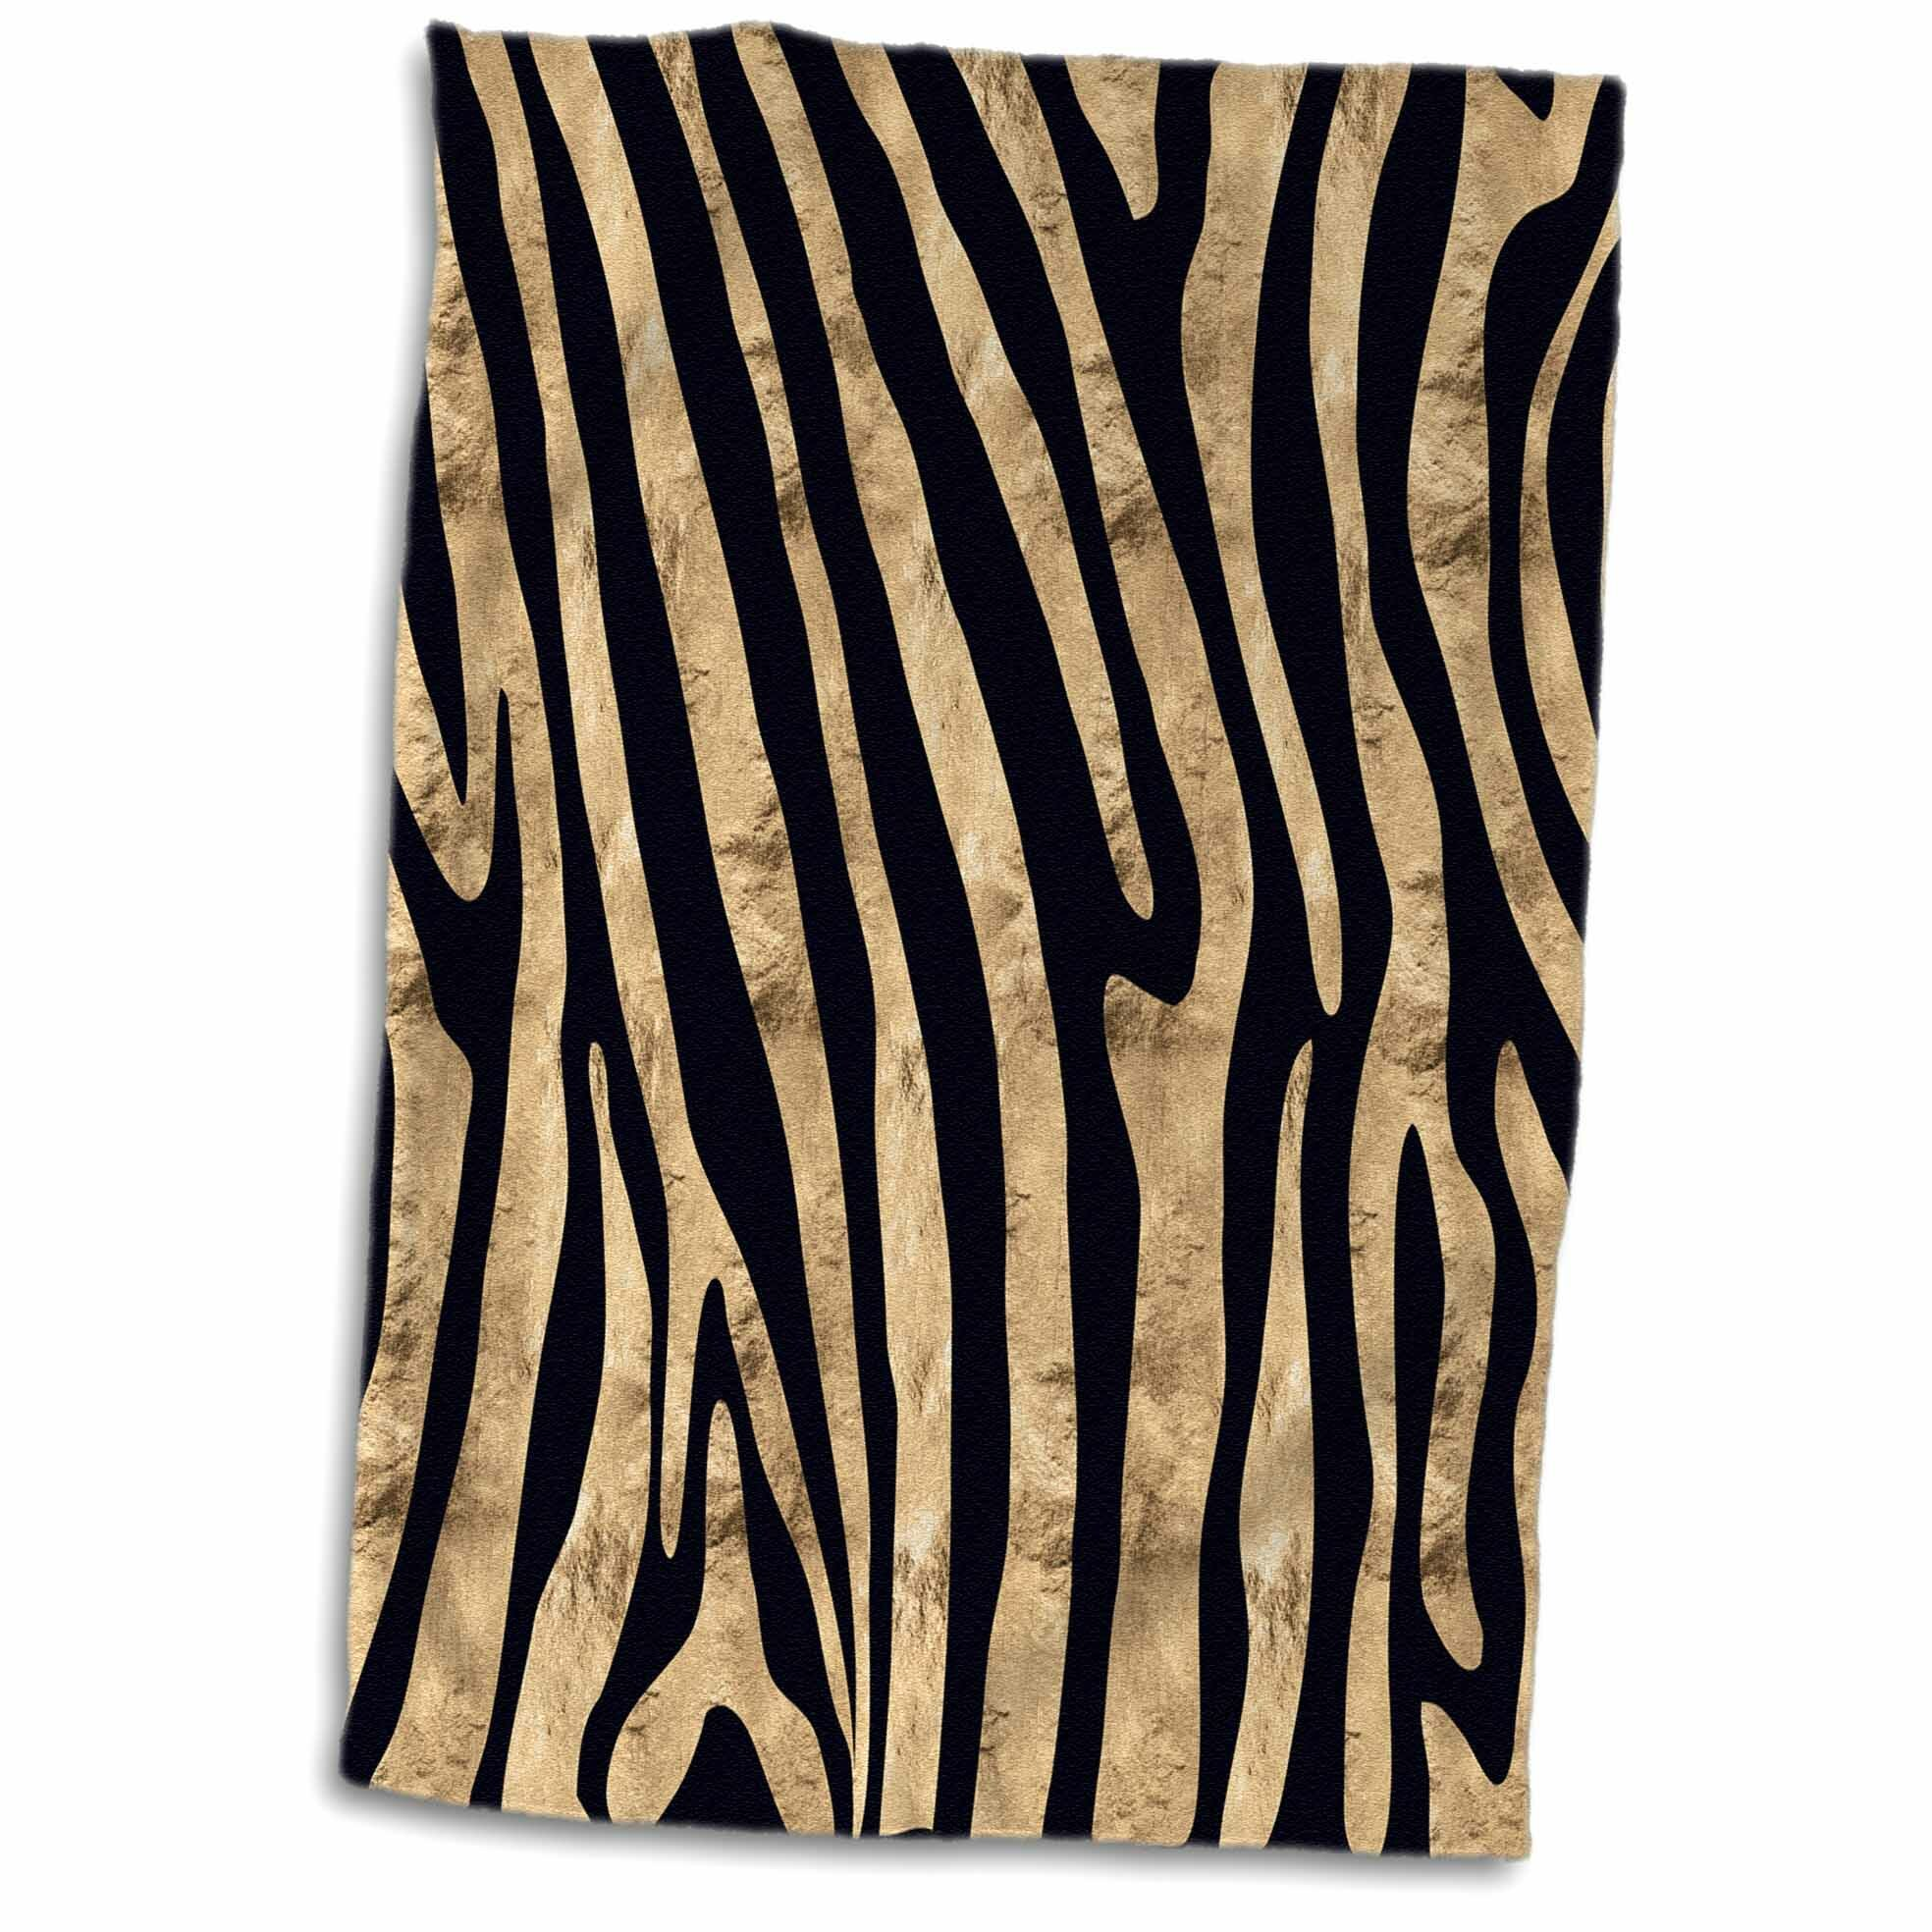 Zebra Tea Towels: East Urban Home Eddy Bold Faux Zebra Stripes Pattern Tea